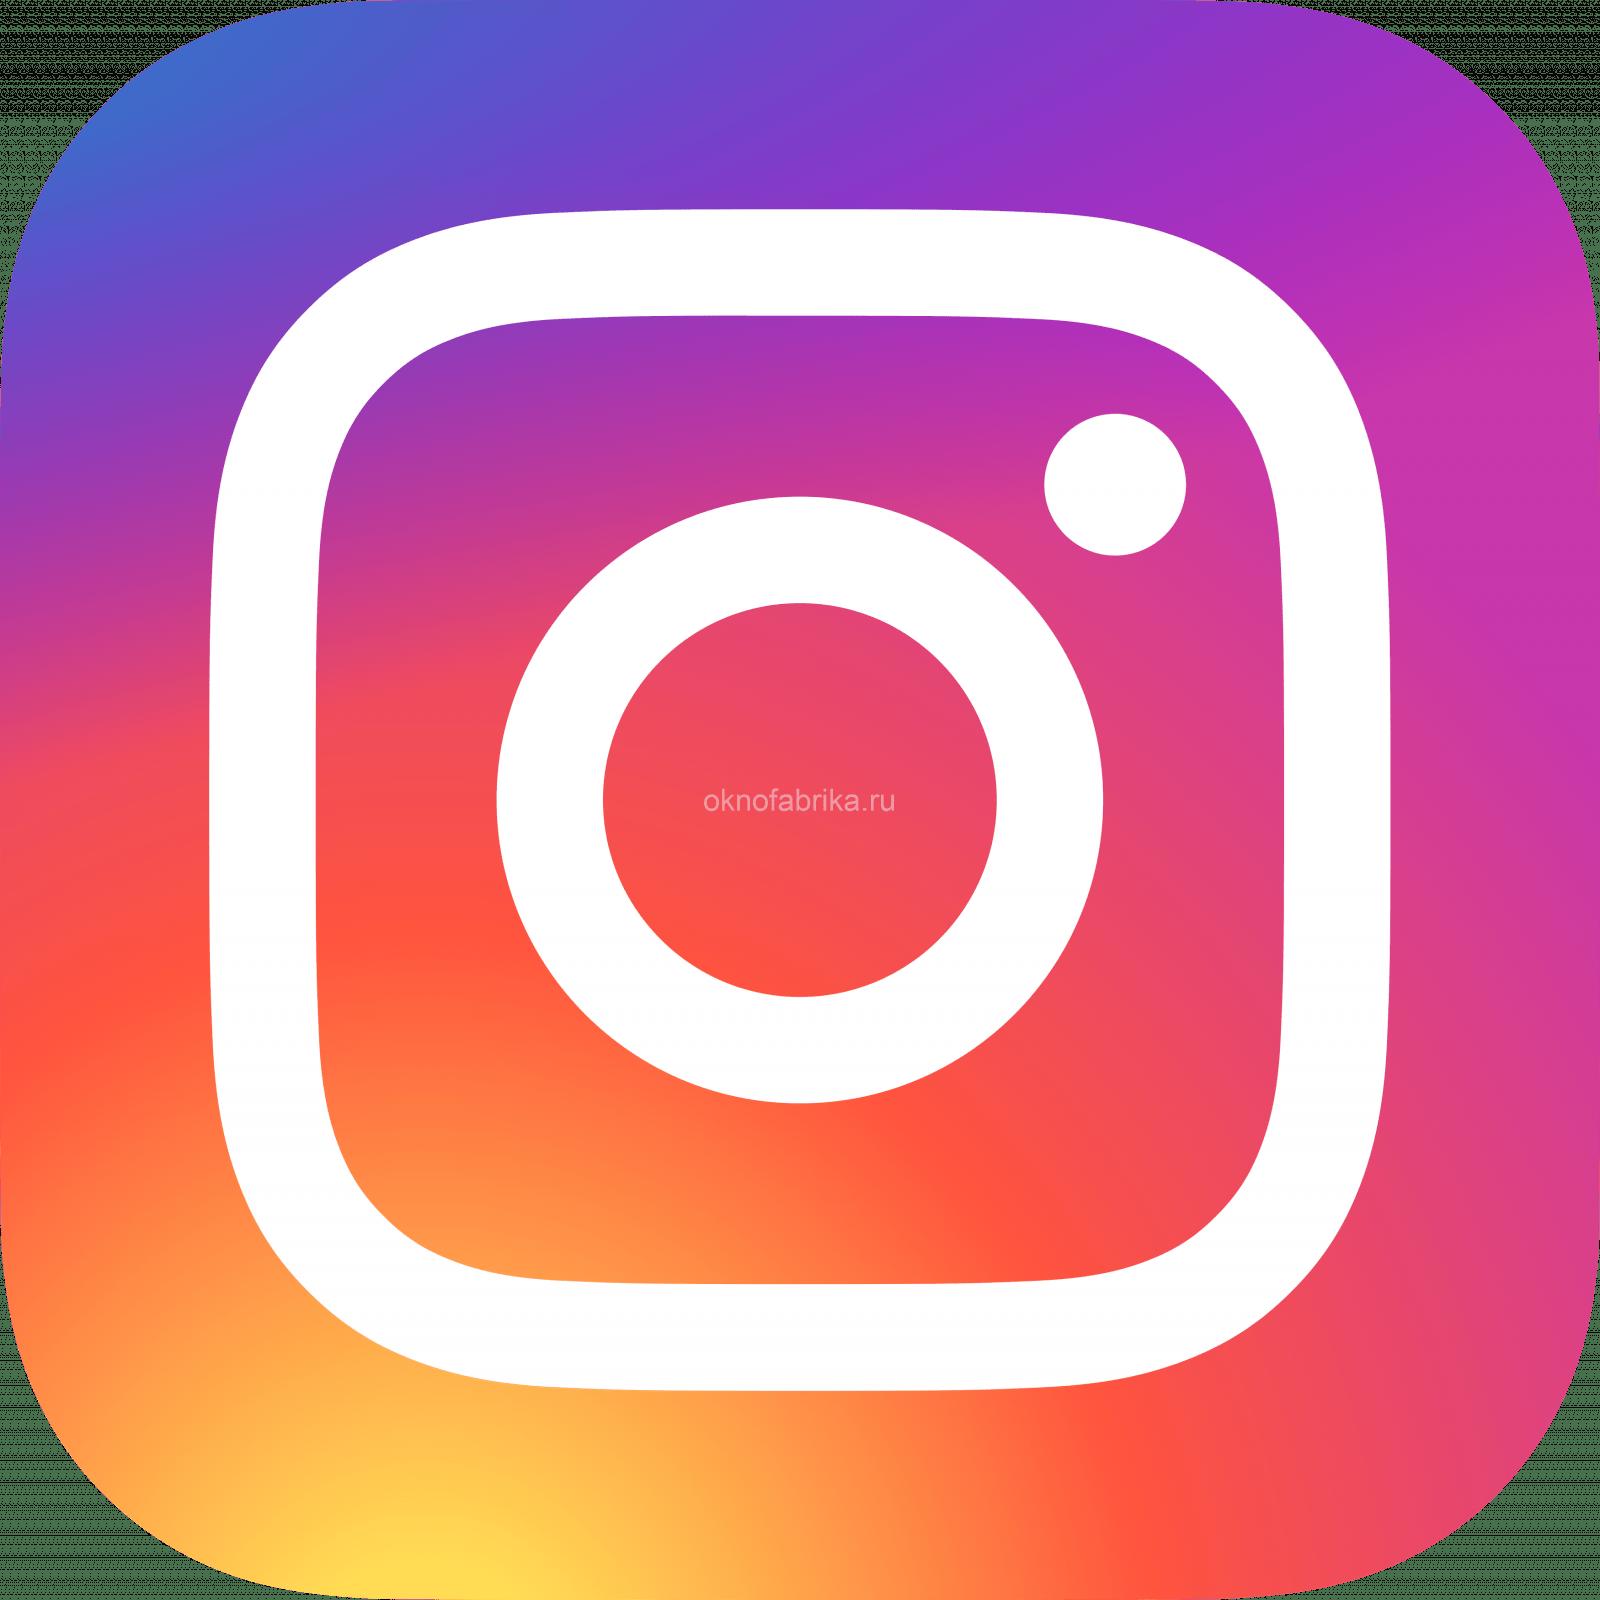 Мягкие окна Кристалл instagram